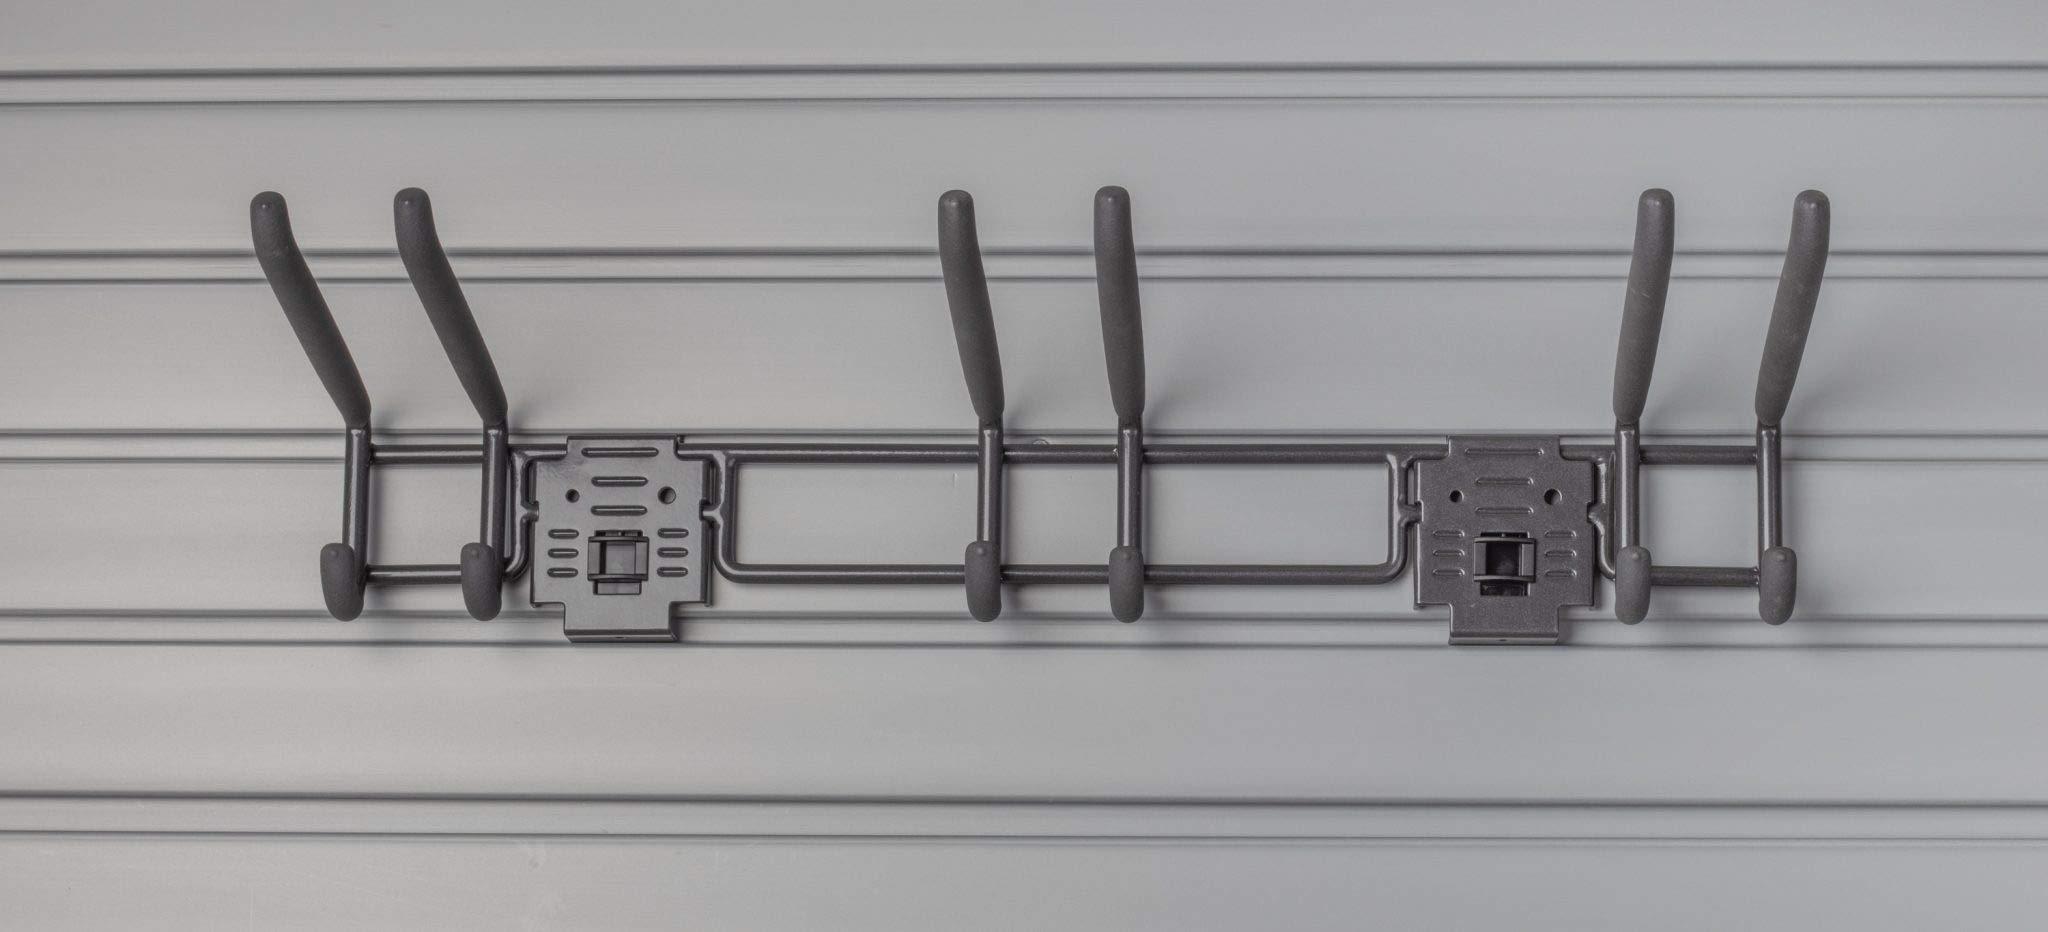 HandiWall 24'' Locking 3-Hook Double Hook Slatwall Tool Storage Bar with Hook Locks by HandiSolutions